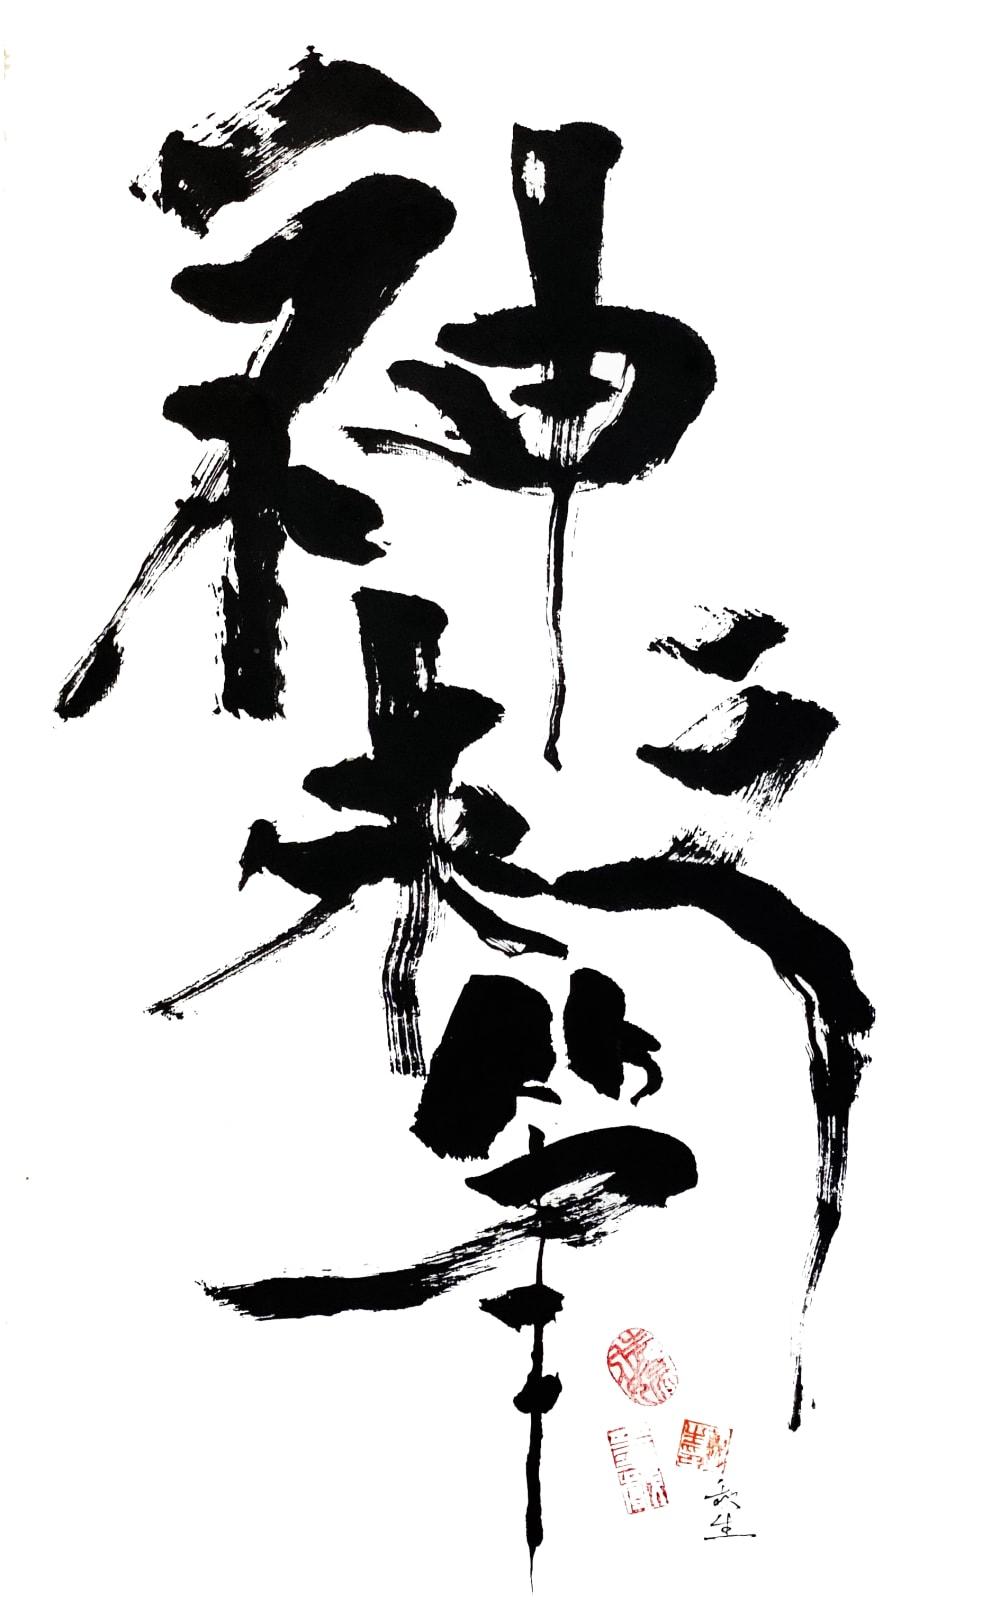 Anthony Wong 黃秋生, Stroke of Genius 神來之筆, 2020